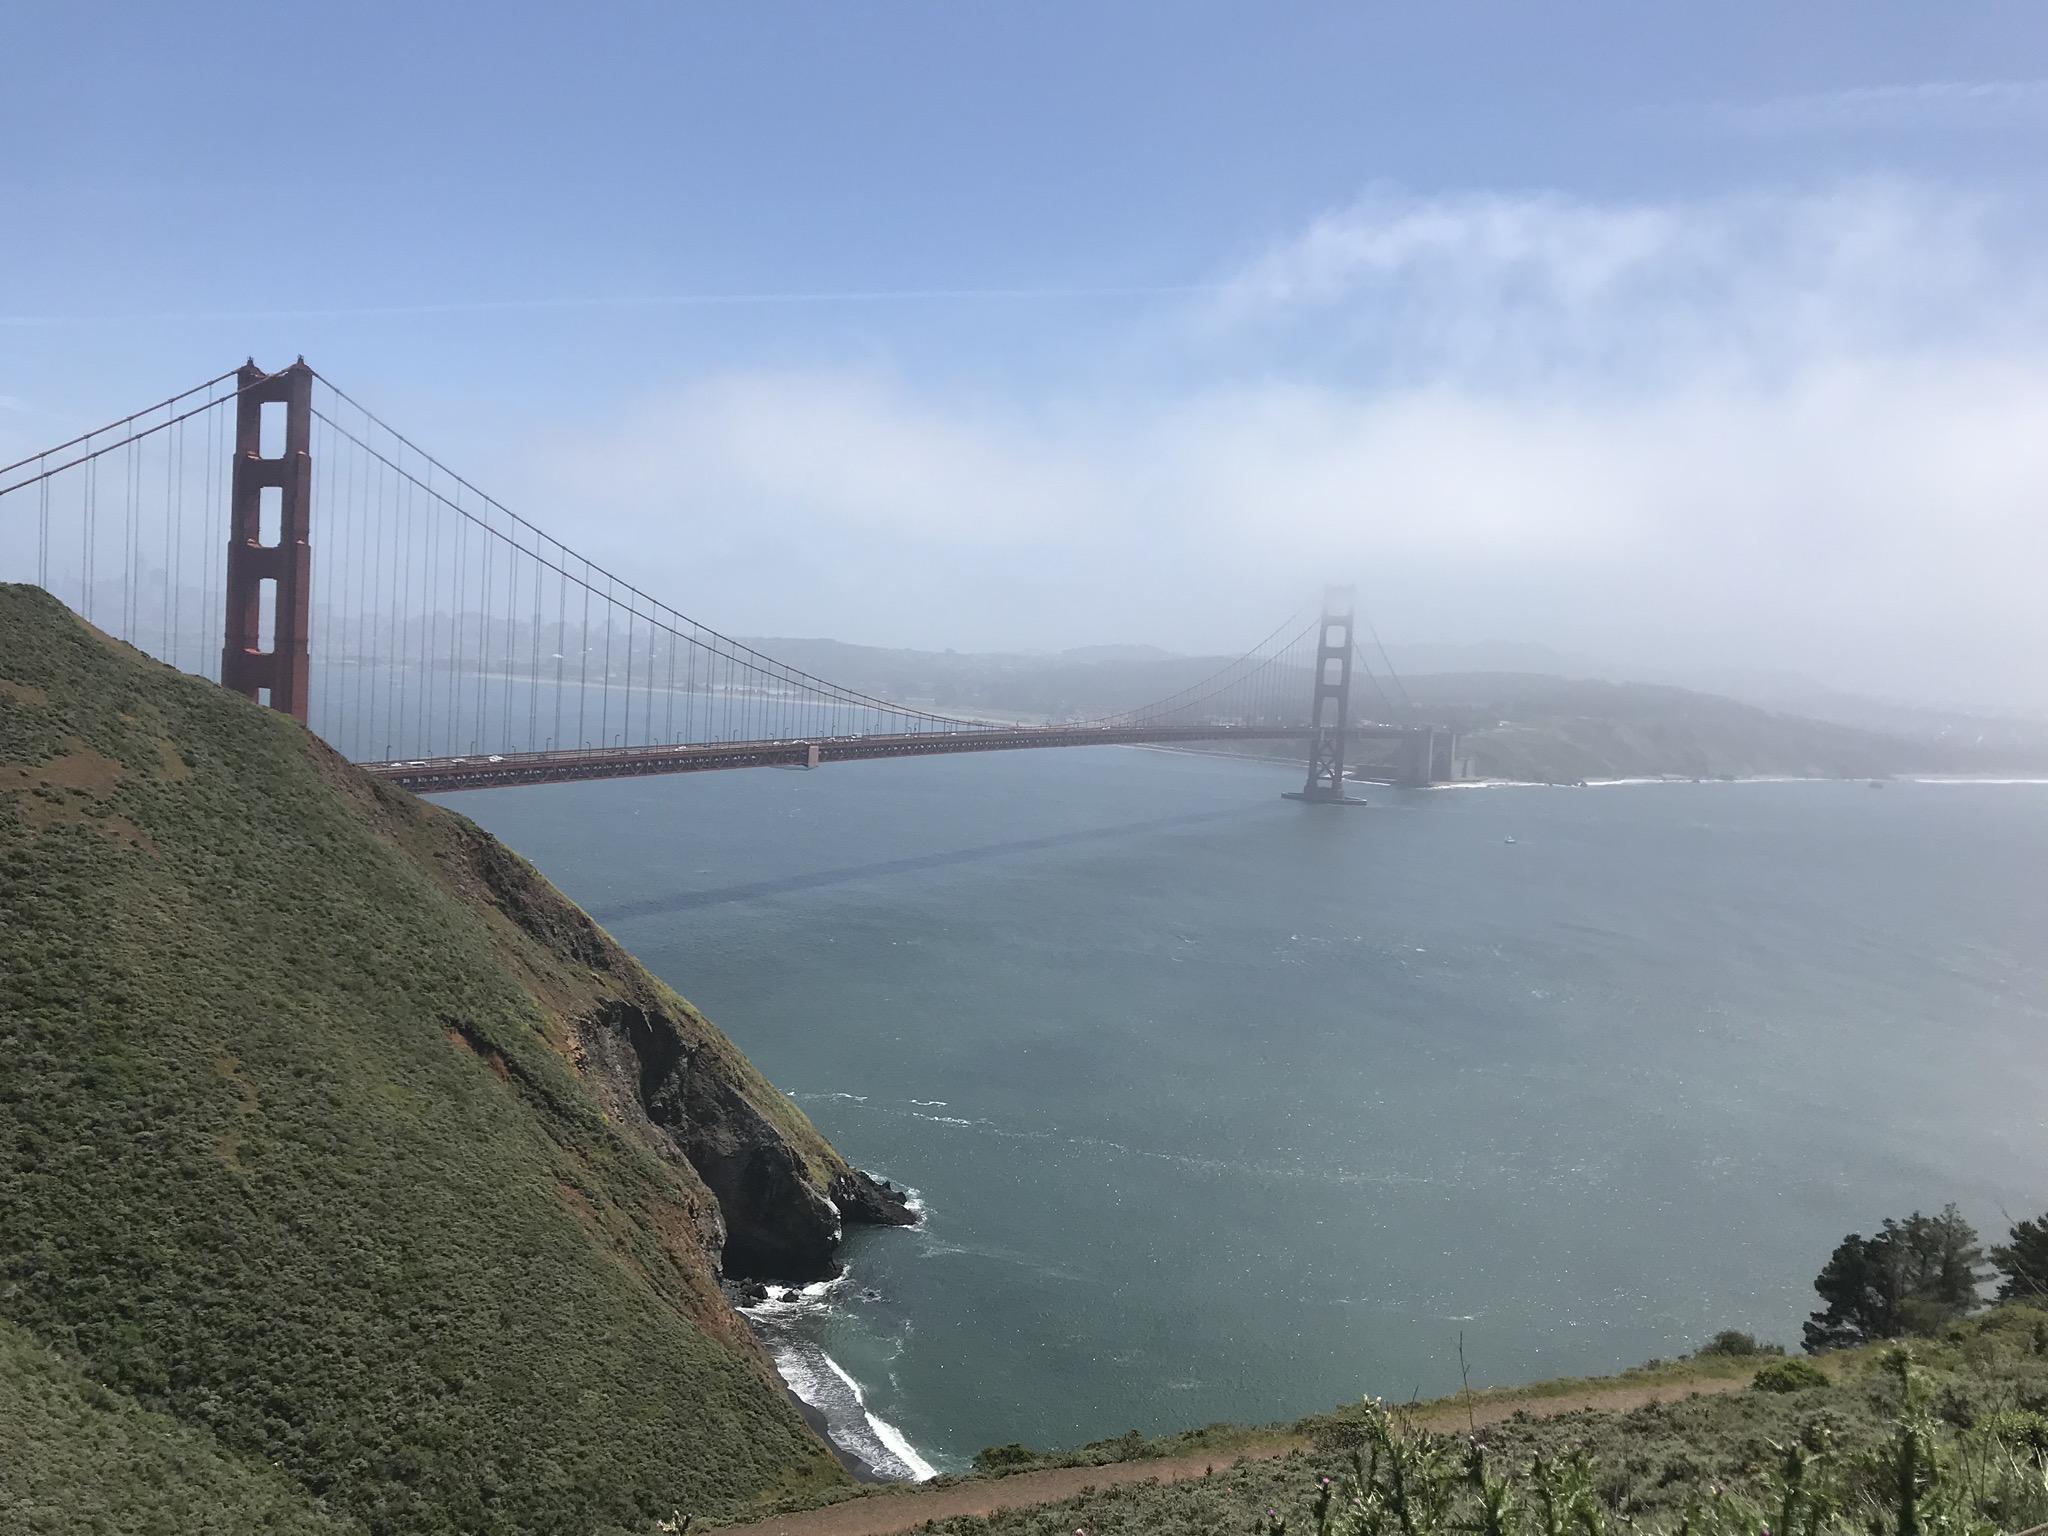 Golden Gate Vista Park, California